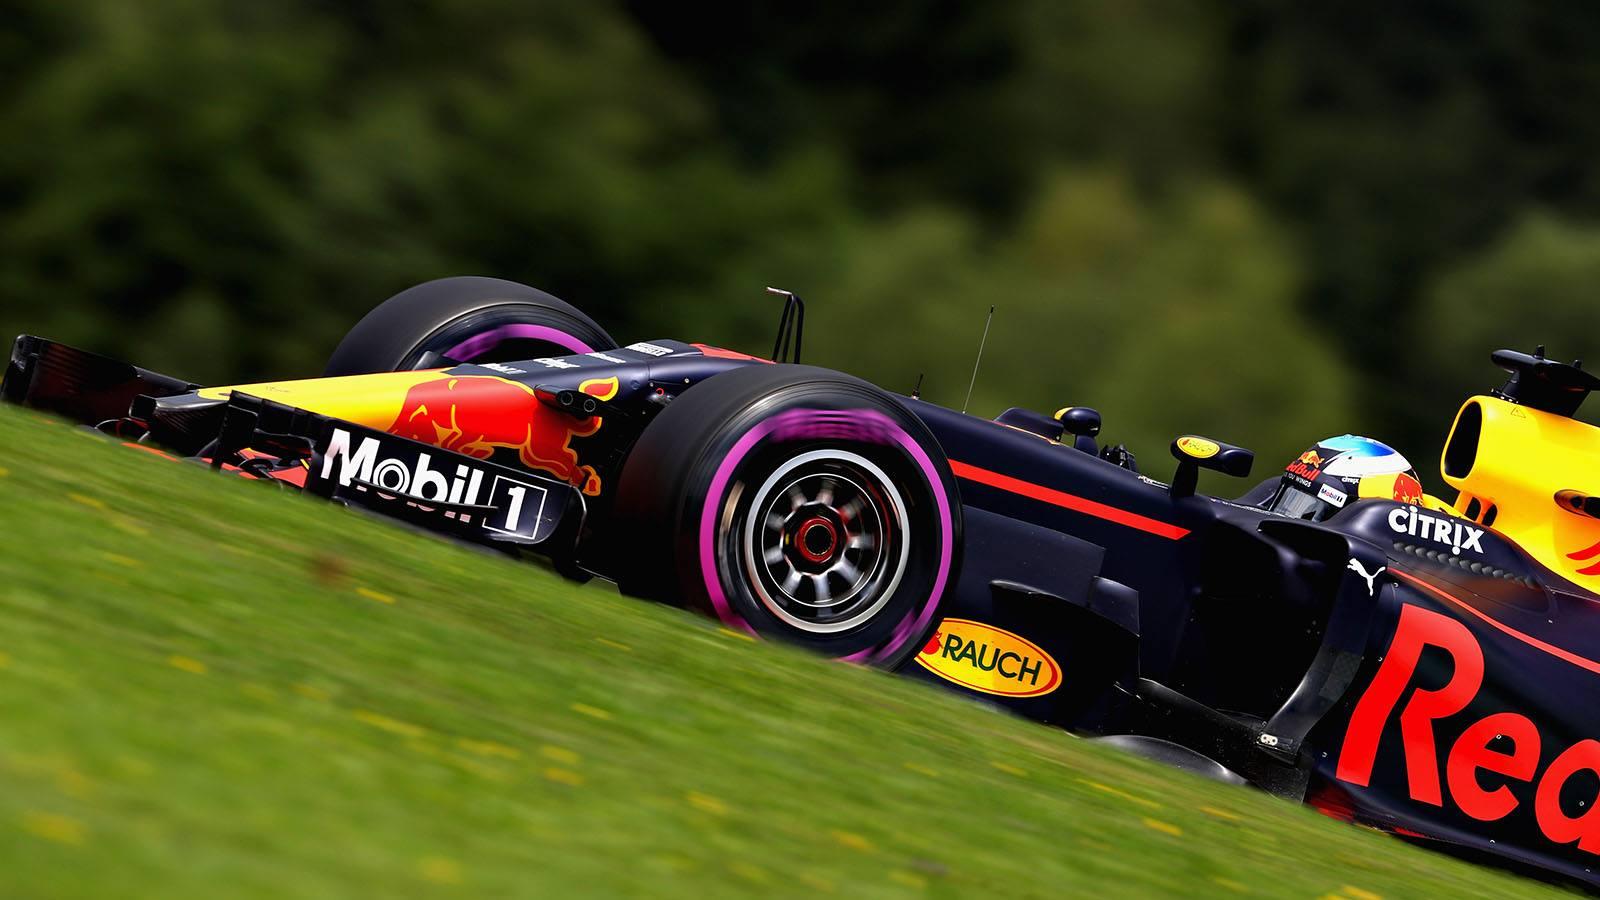 E tome shoey. Cinco pódios seguidos para Ricciardo.